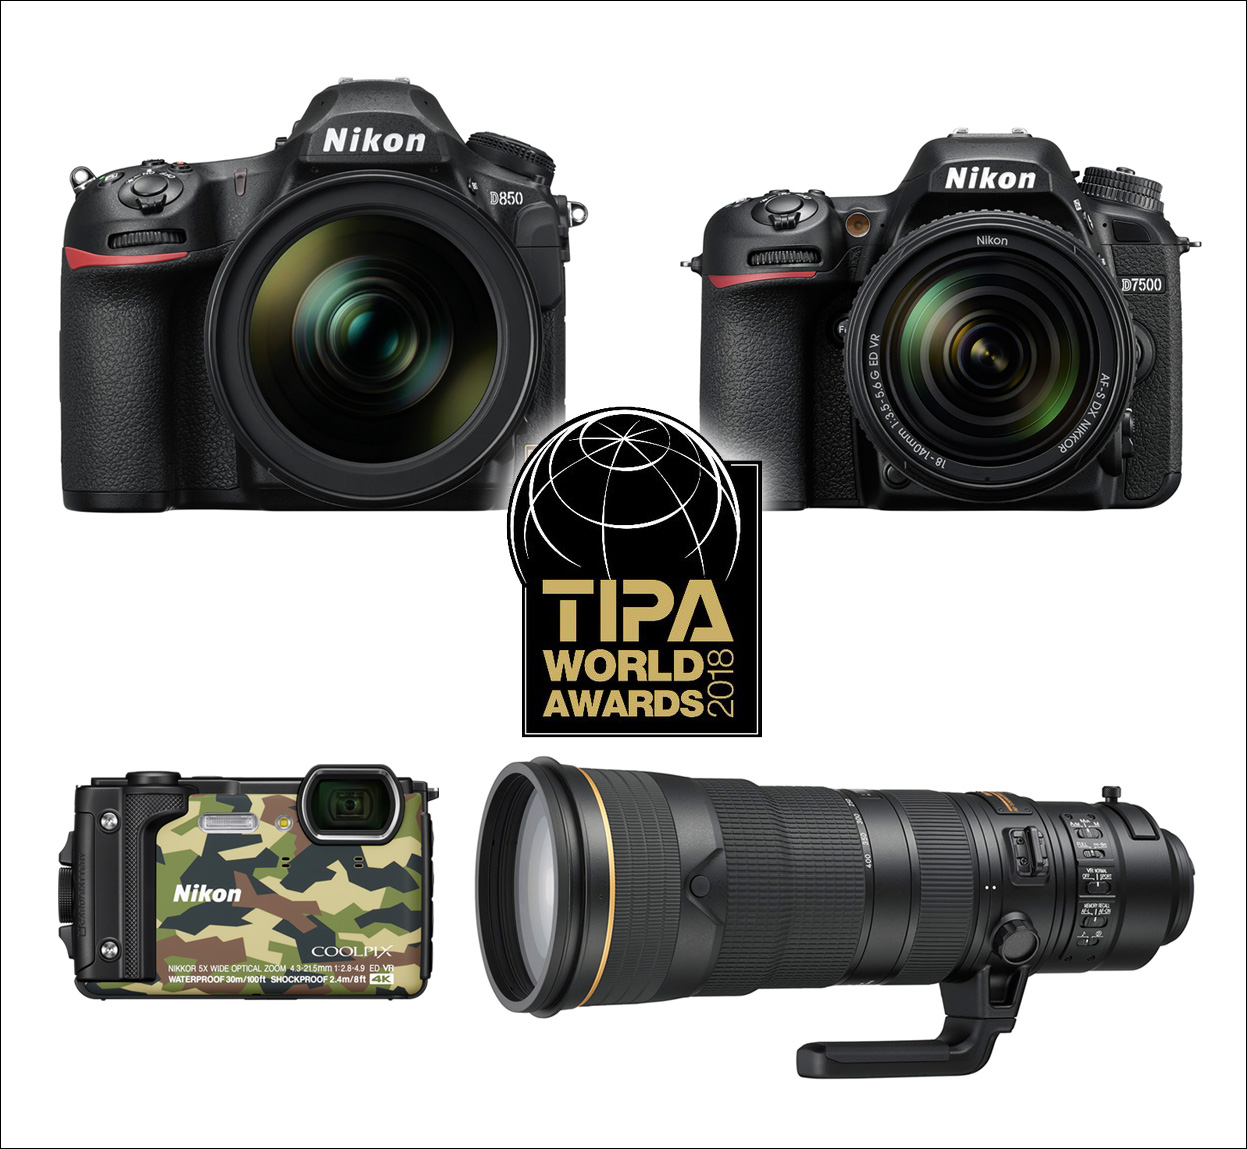 TIPA 2018 –Nikon